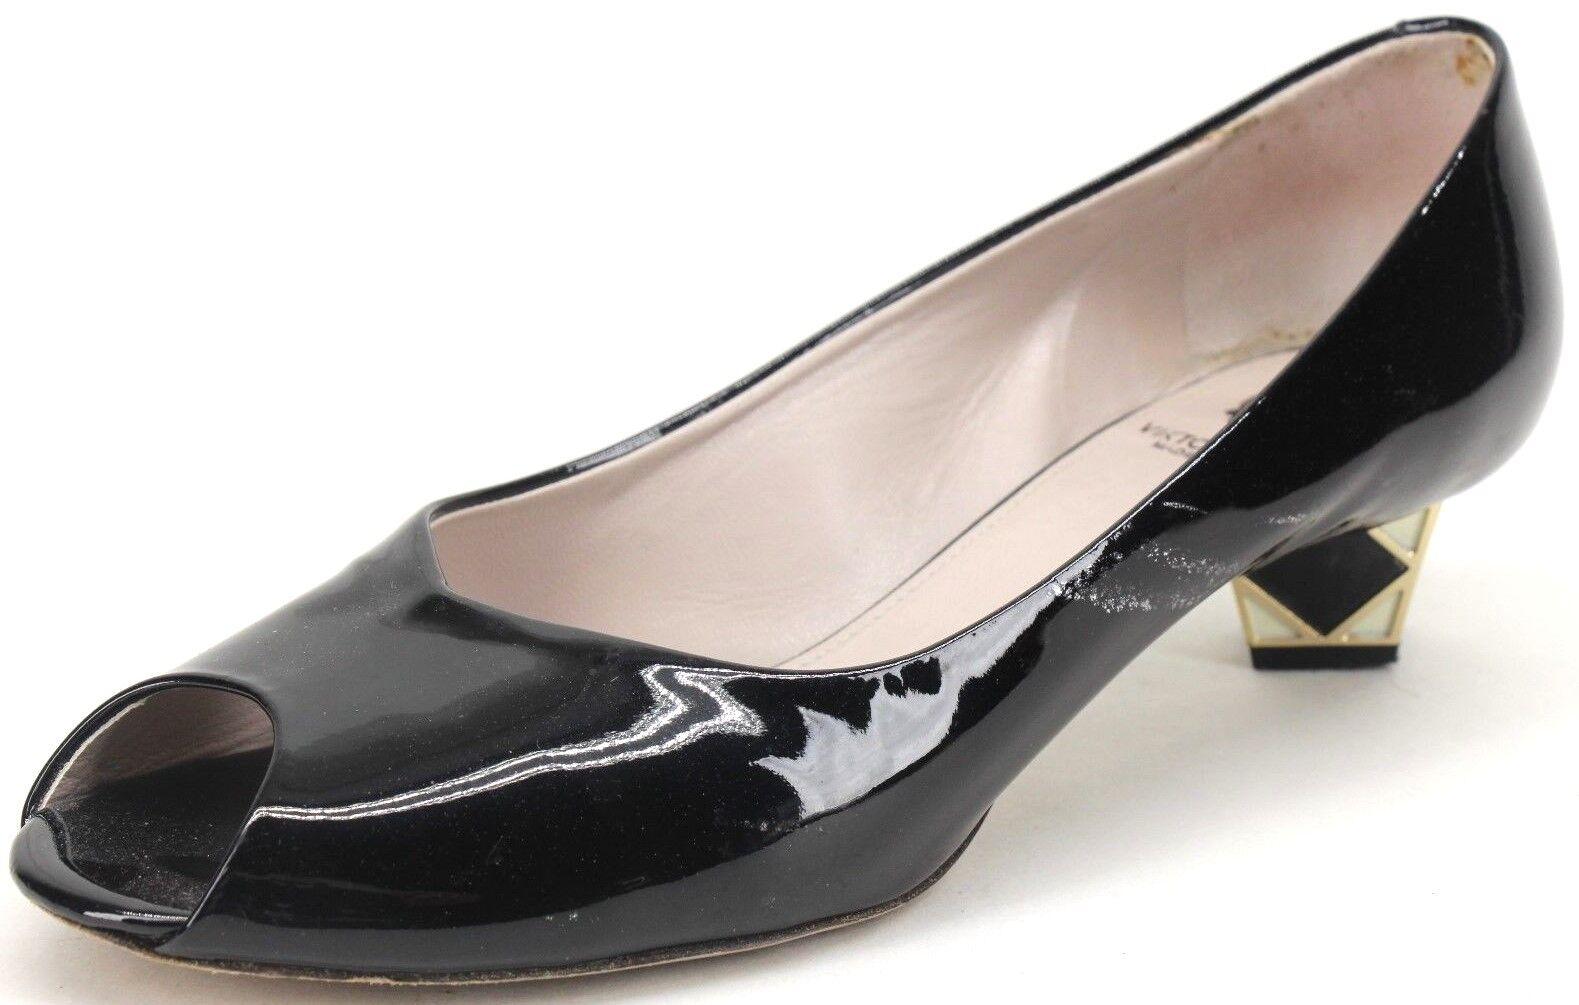 Viktor & Rolf Women's Black Patent Leather Peep Toe Kitten Block Heels